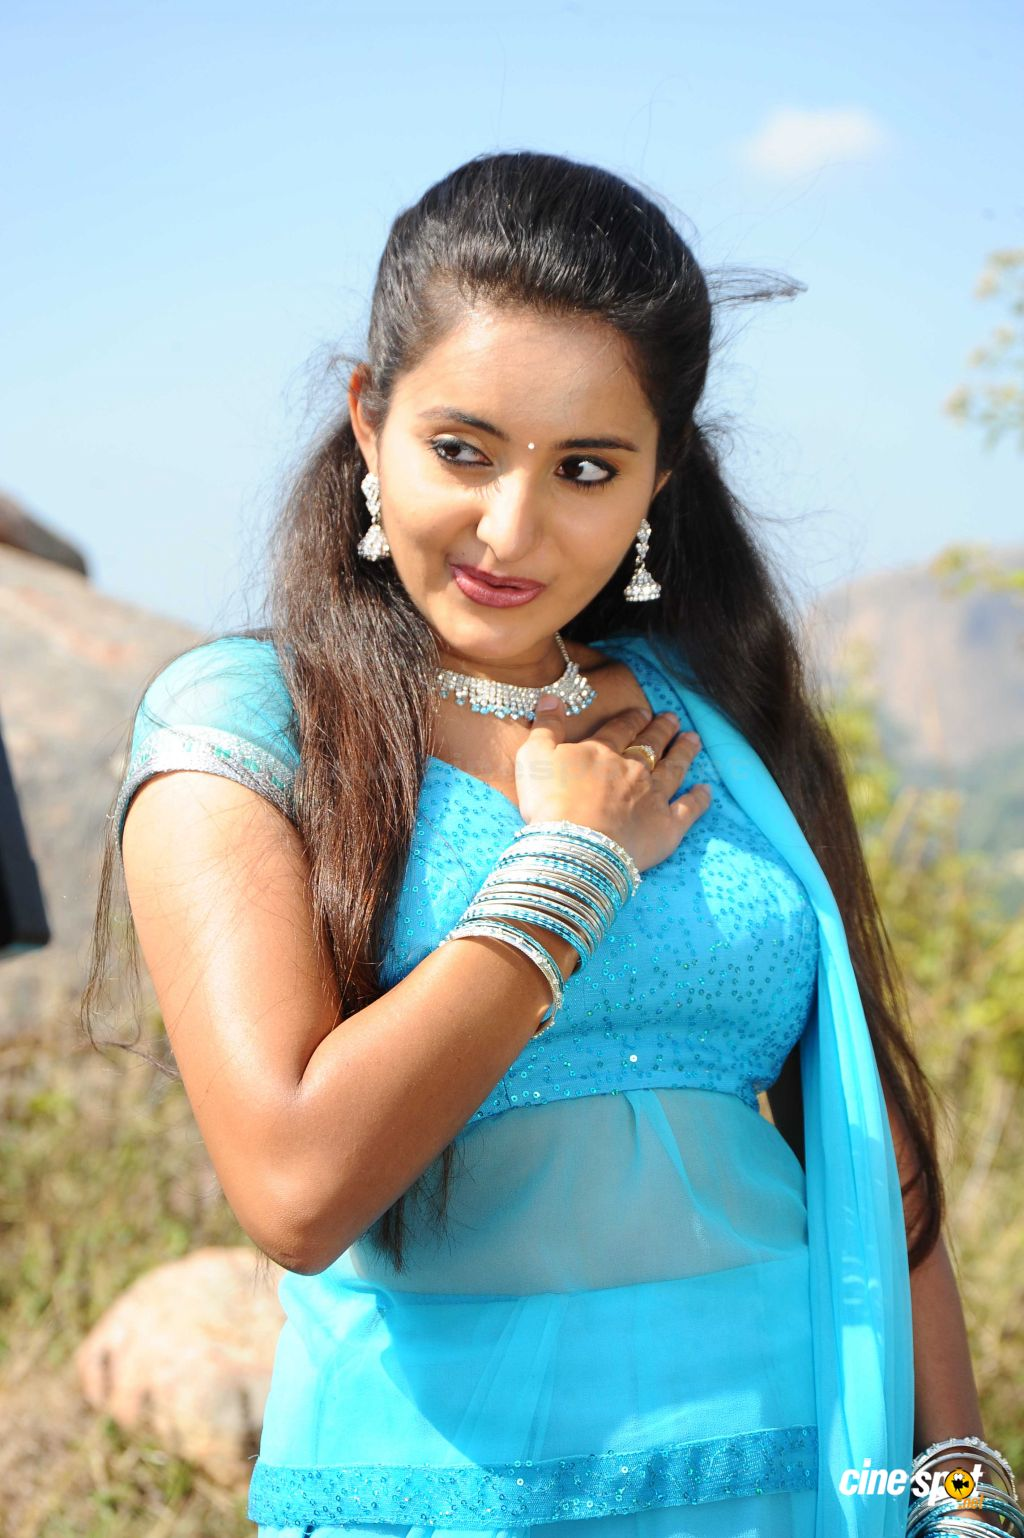 Hot Photos, Malayalam, - Hot Malayalam Actress Unseen , HD Wallpaper & Backgrounds